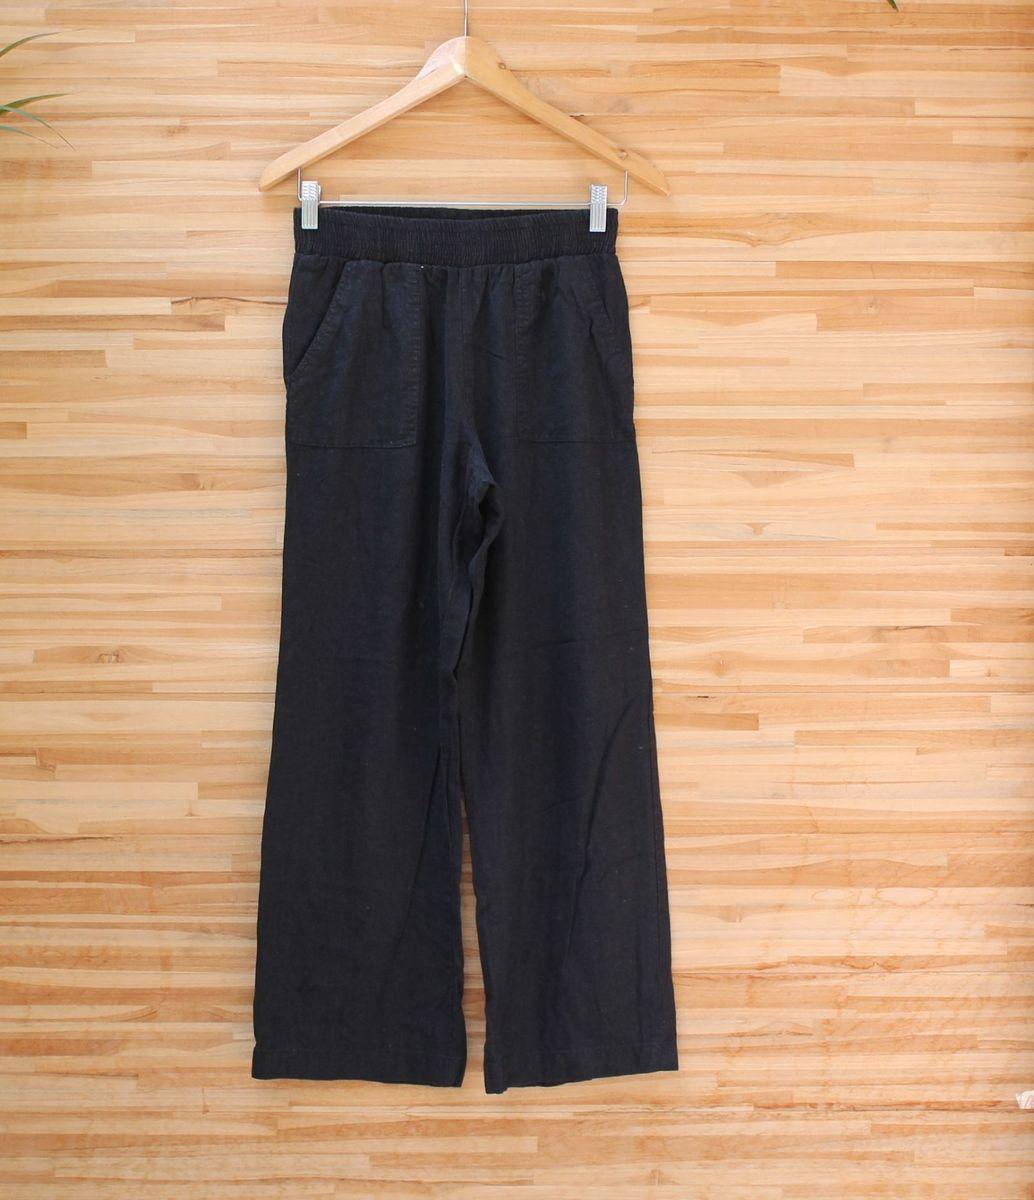 79209cf37 calça preta larga forever 21 - calças forever 21.  Czm6ly9wag90b3muzw5qb2vplmnvbs5ici9wcm9kdwn0cy80odq0mdyvzgi3zdiymme0odi0zgi5otfhztq2zge2ndy3owvlymyuanbn  ...